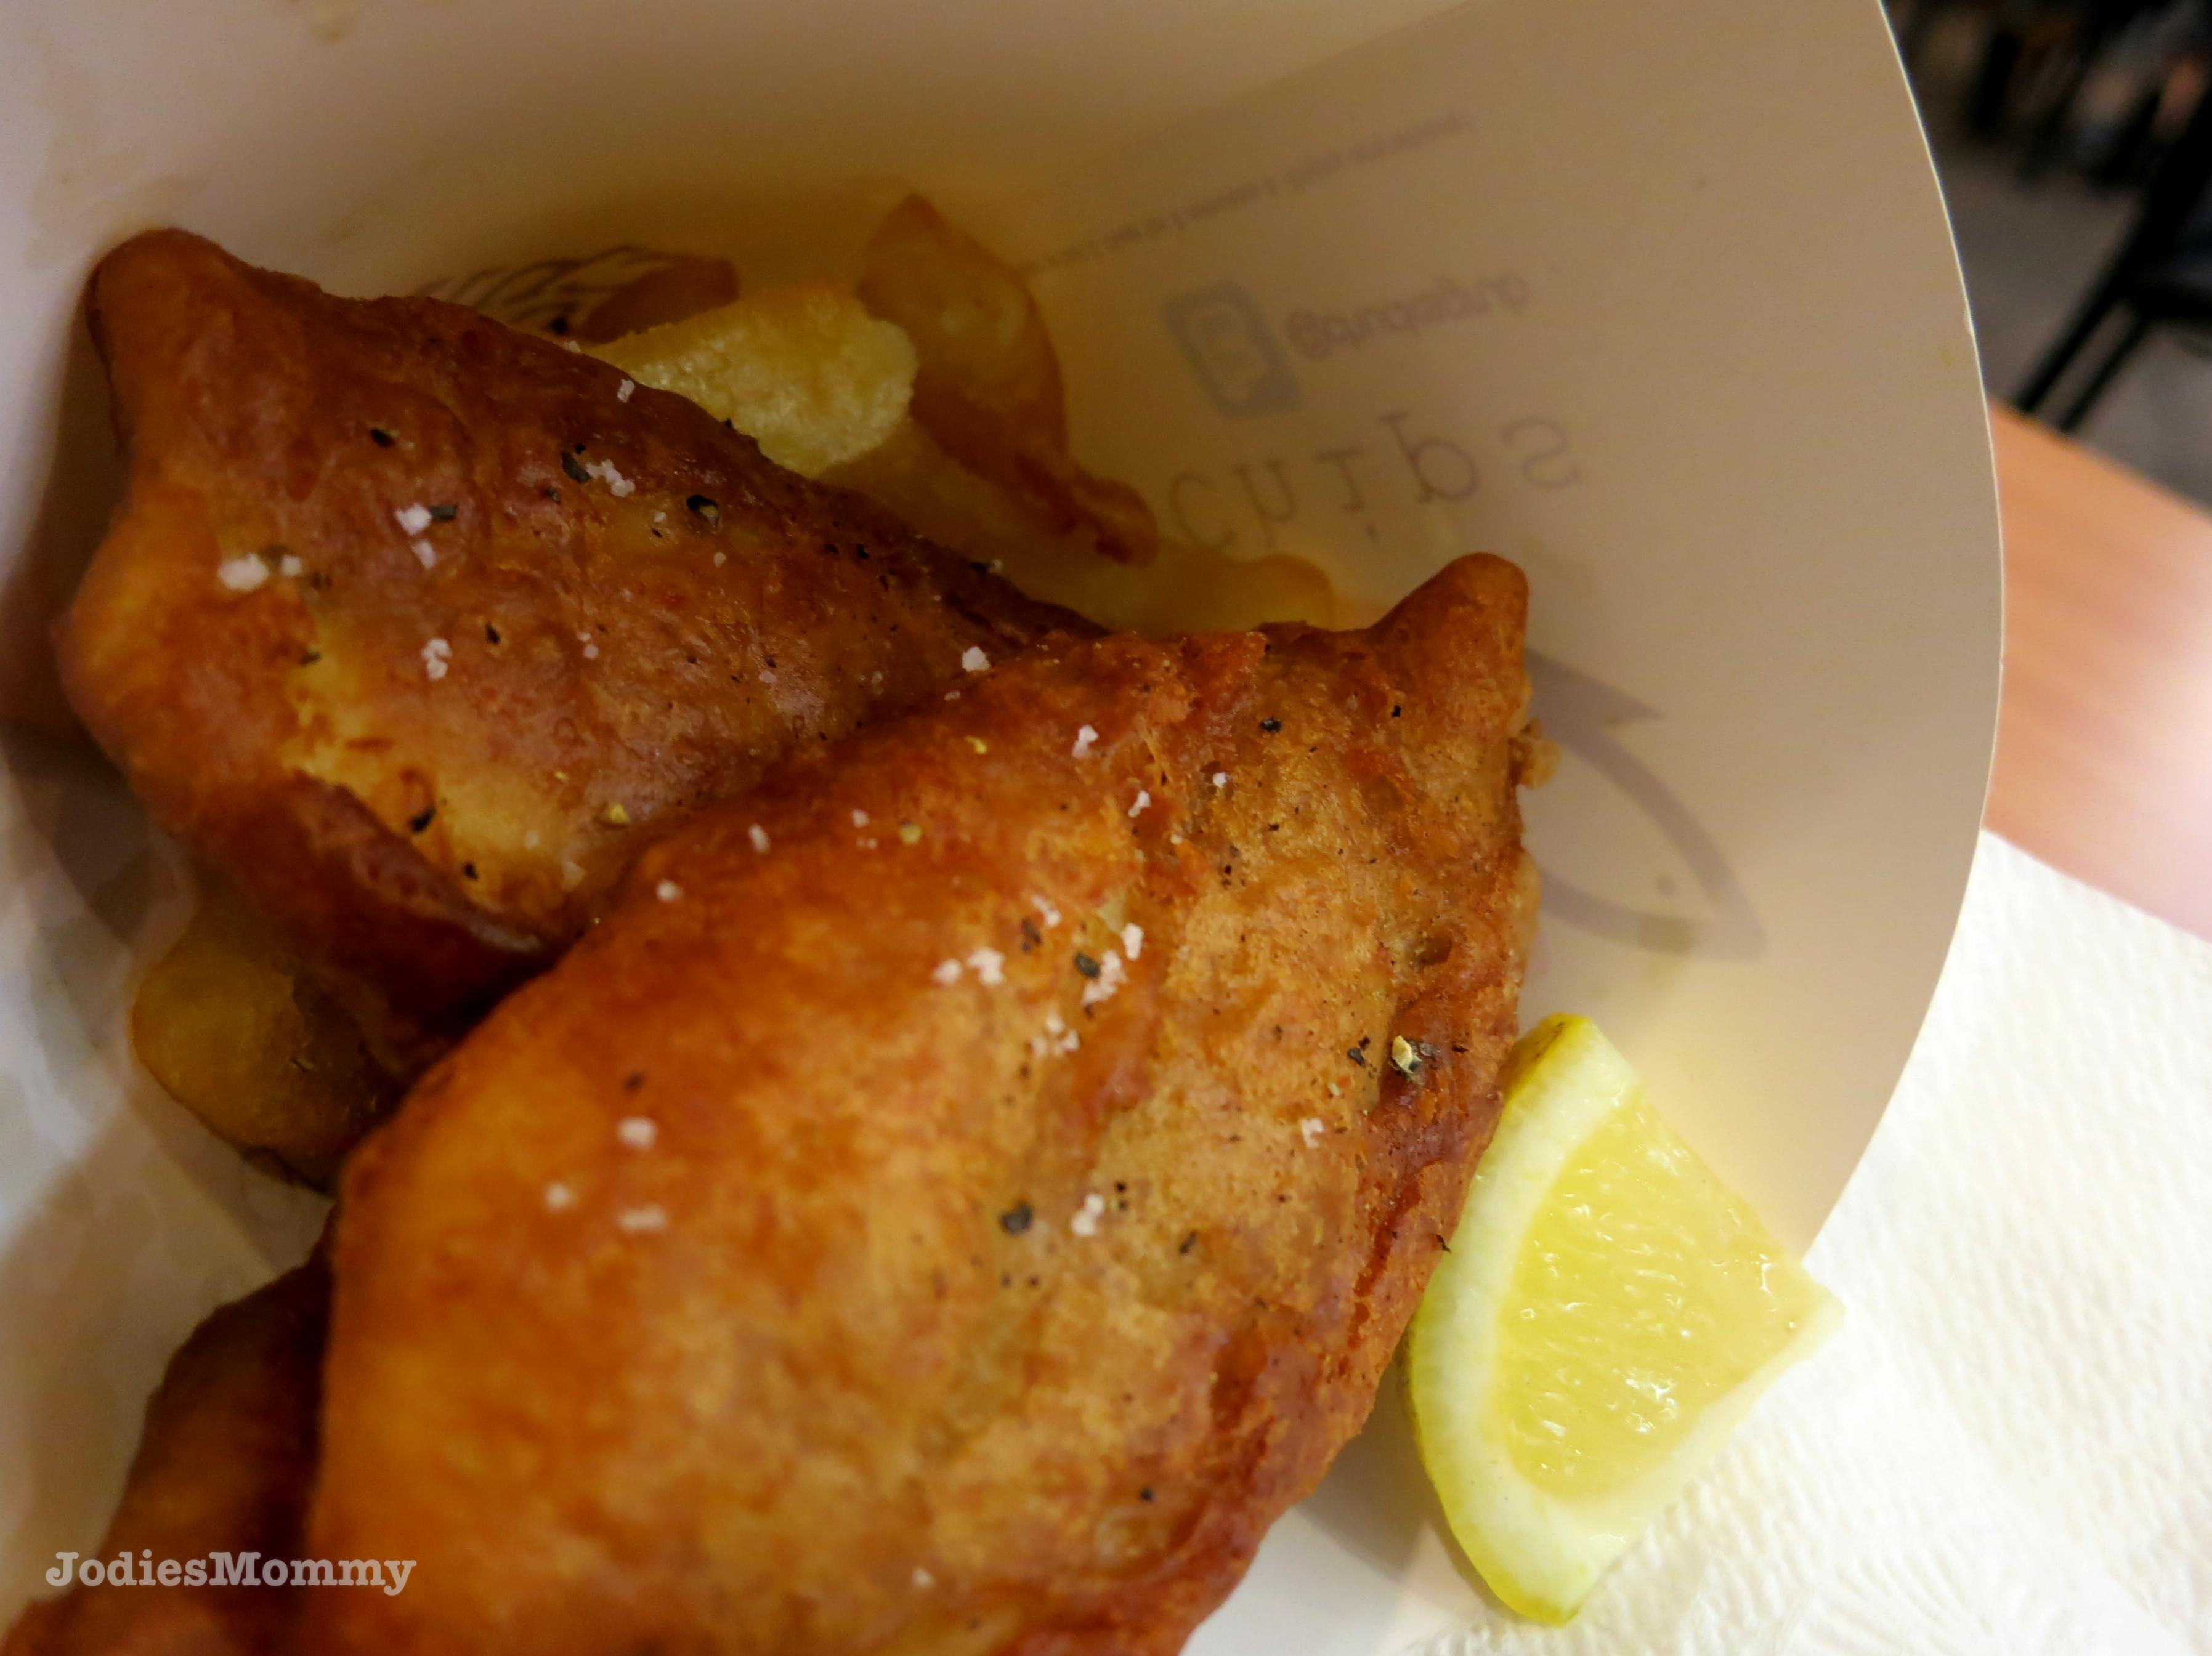 Chuck s grub a journey into my tummy for Chucks fish menu